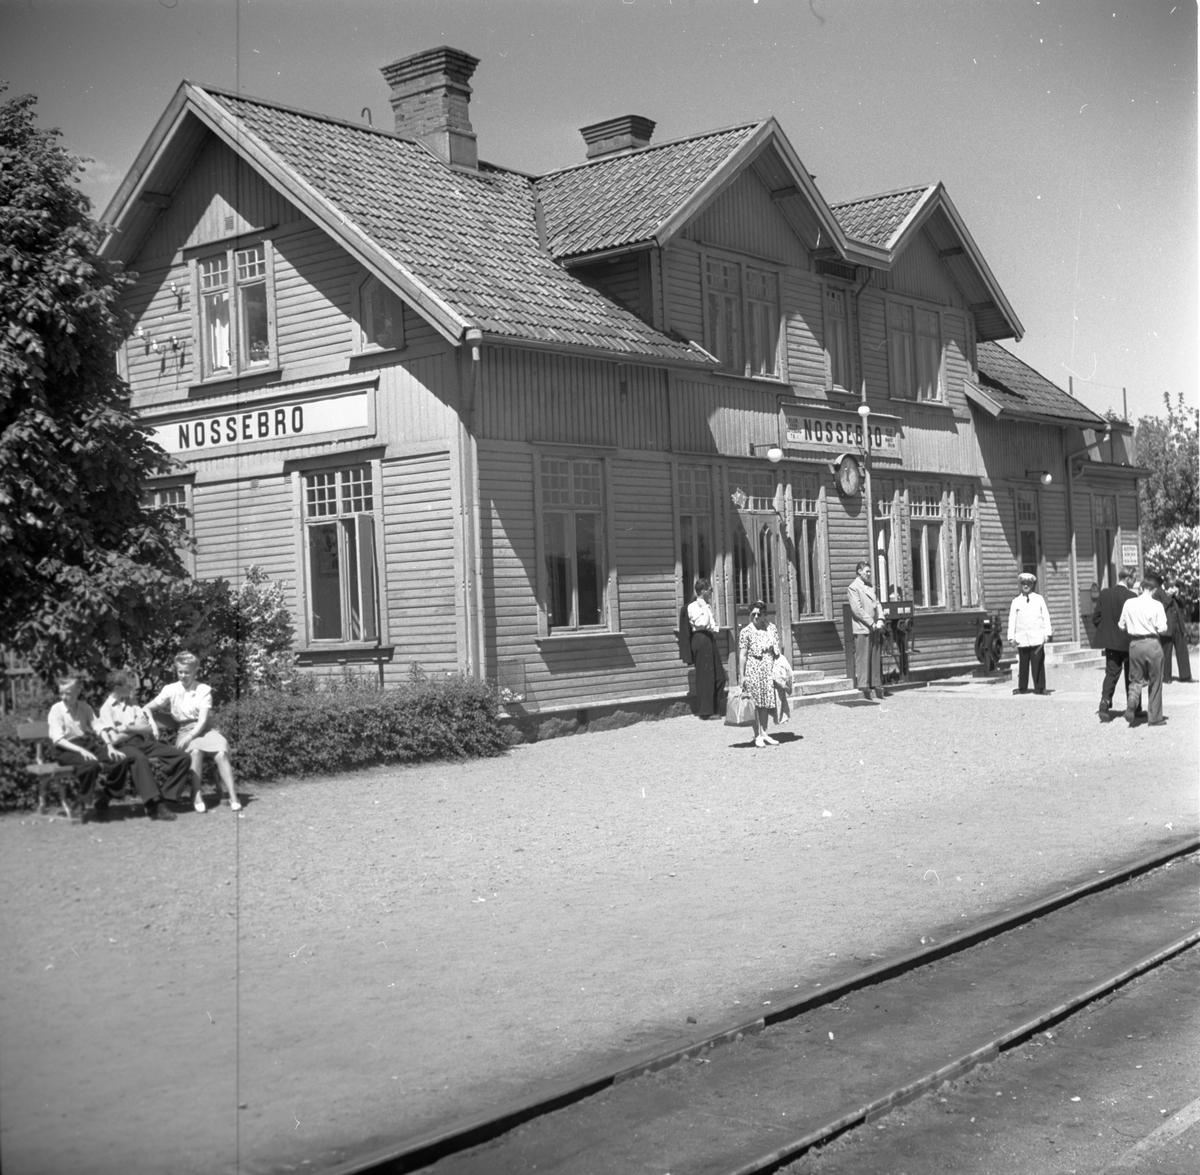 Nossebro station.